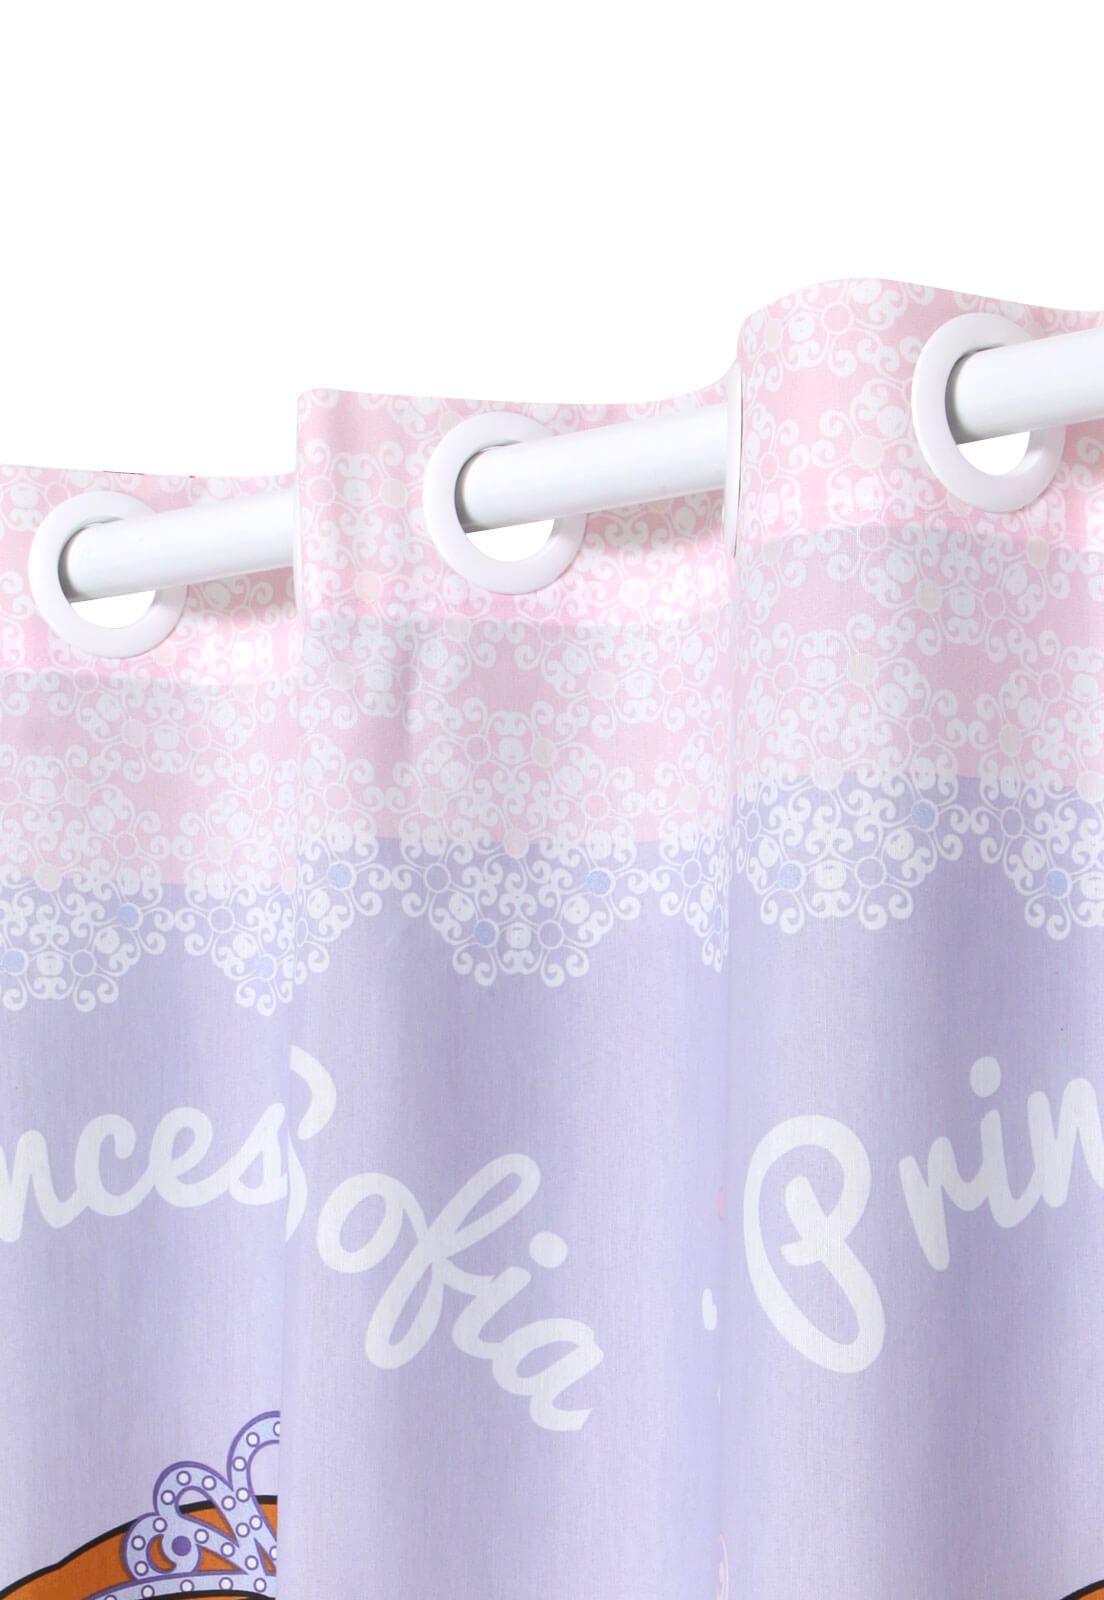 Cortina Infantil Princesa Sofia Sweet Com Forro Blackout 2,00 x 1,80 Santista